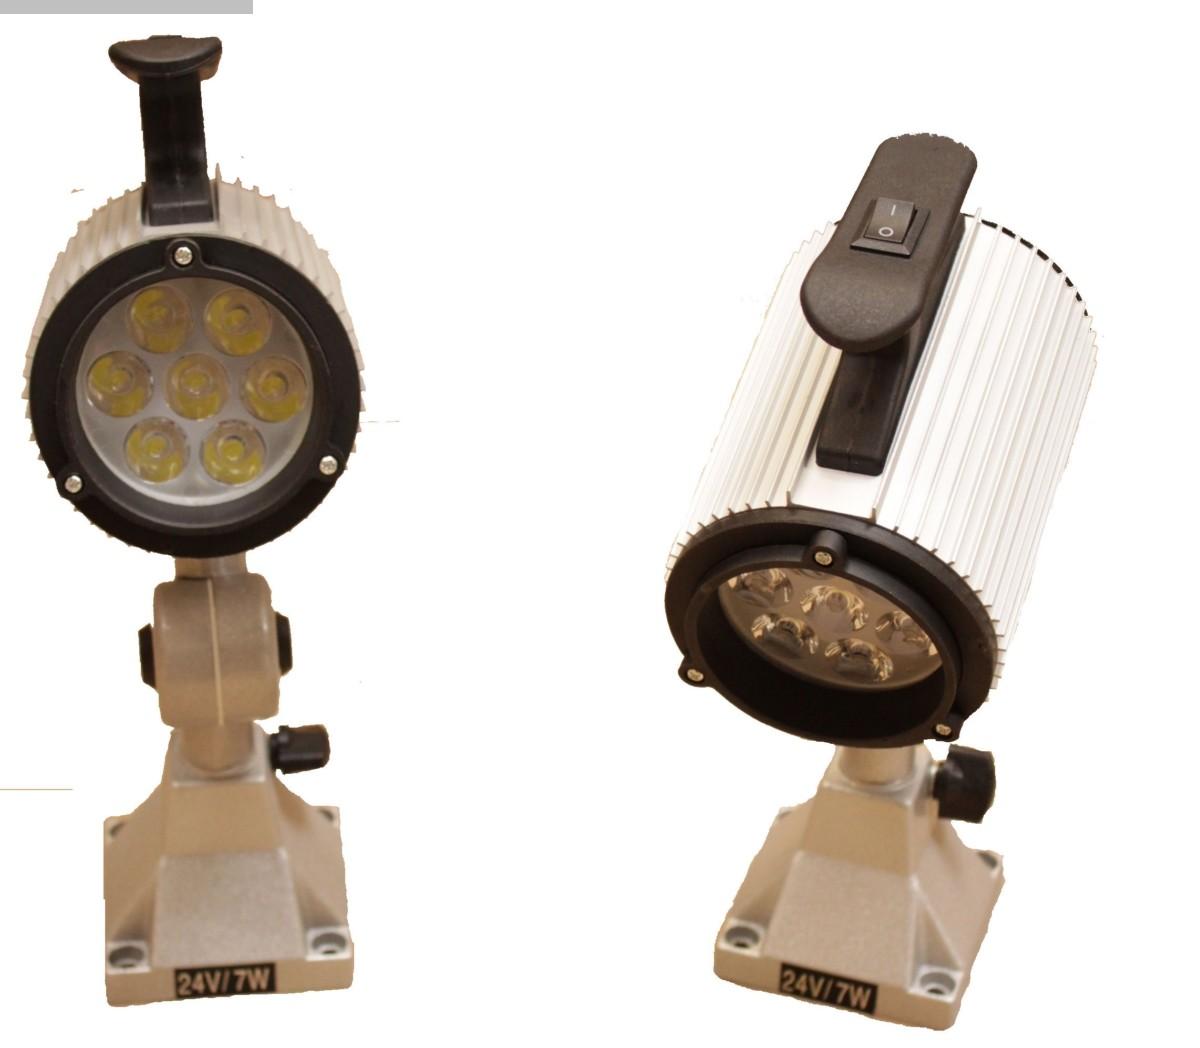 Attrezzatura per l'industria ed attrezzature industriali Aalenbach LED Maschinenlampen kurz